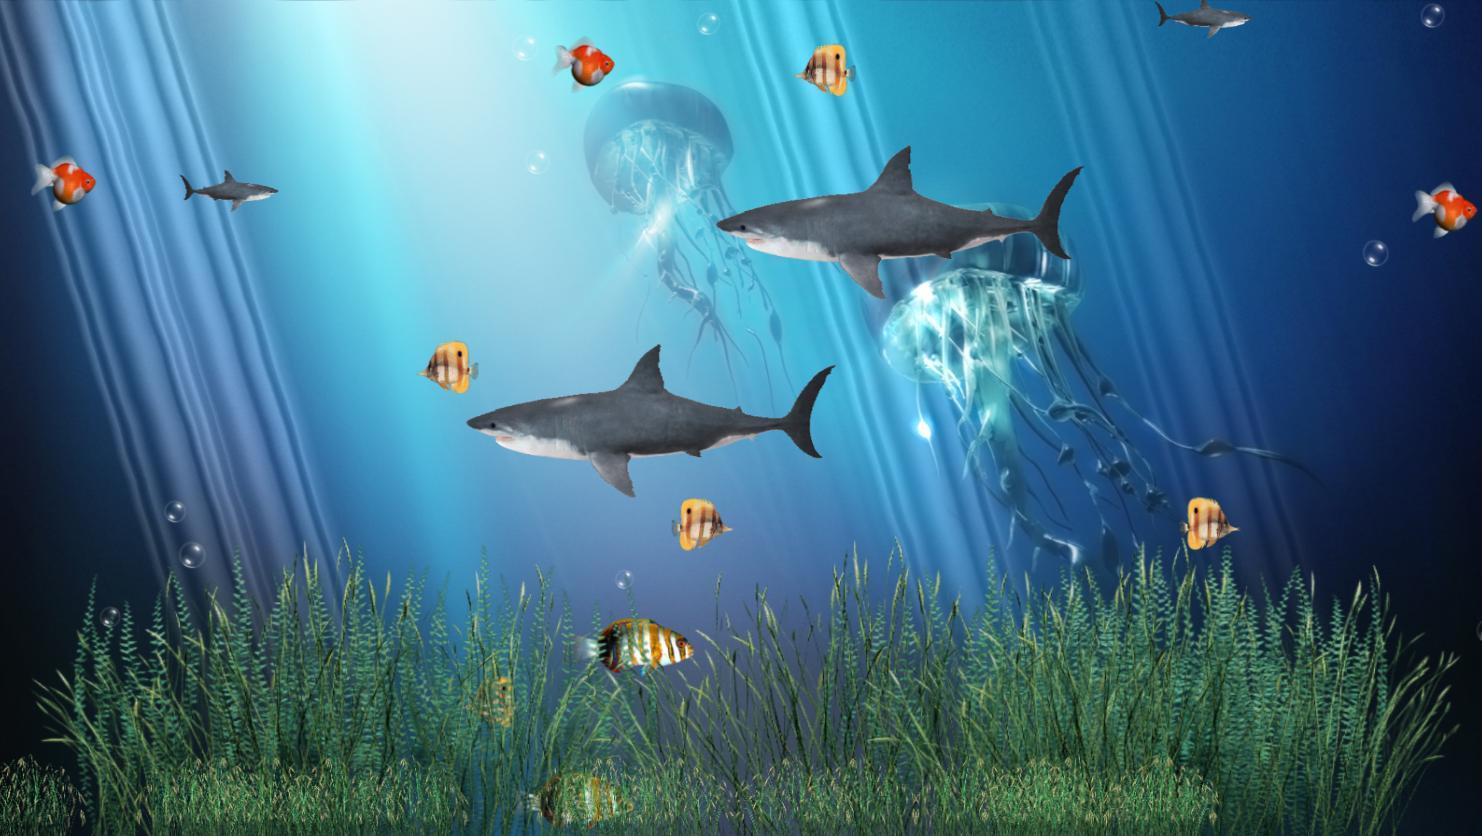 download coral reef aquarium animated wallpaper download screensaver 1482x836